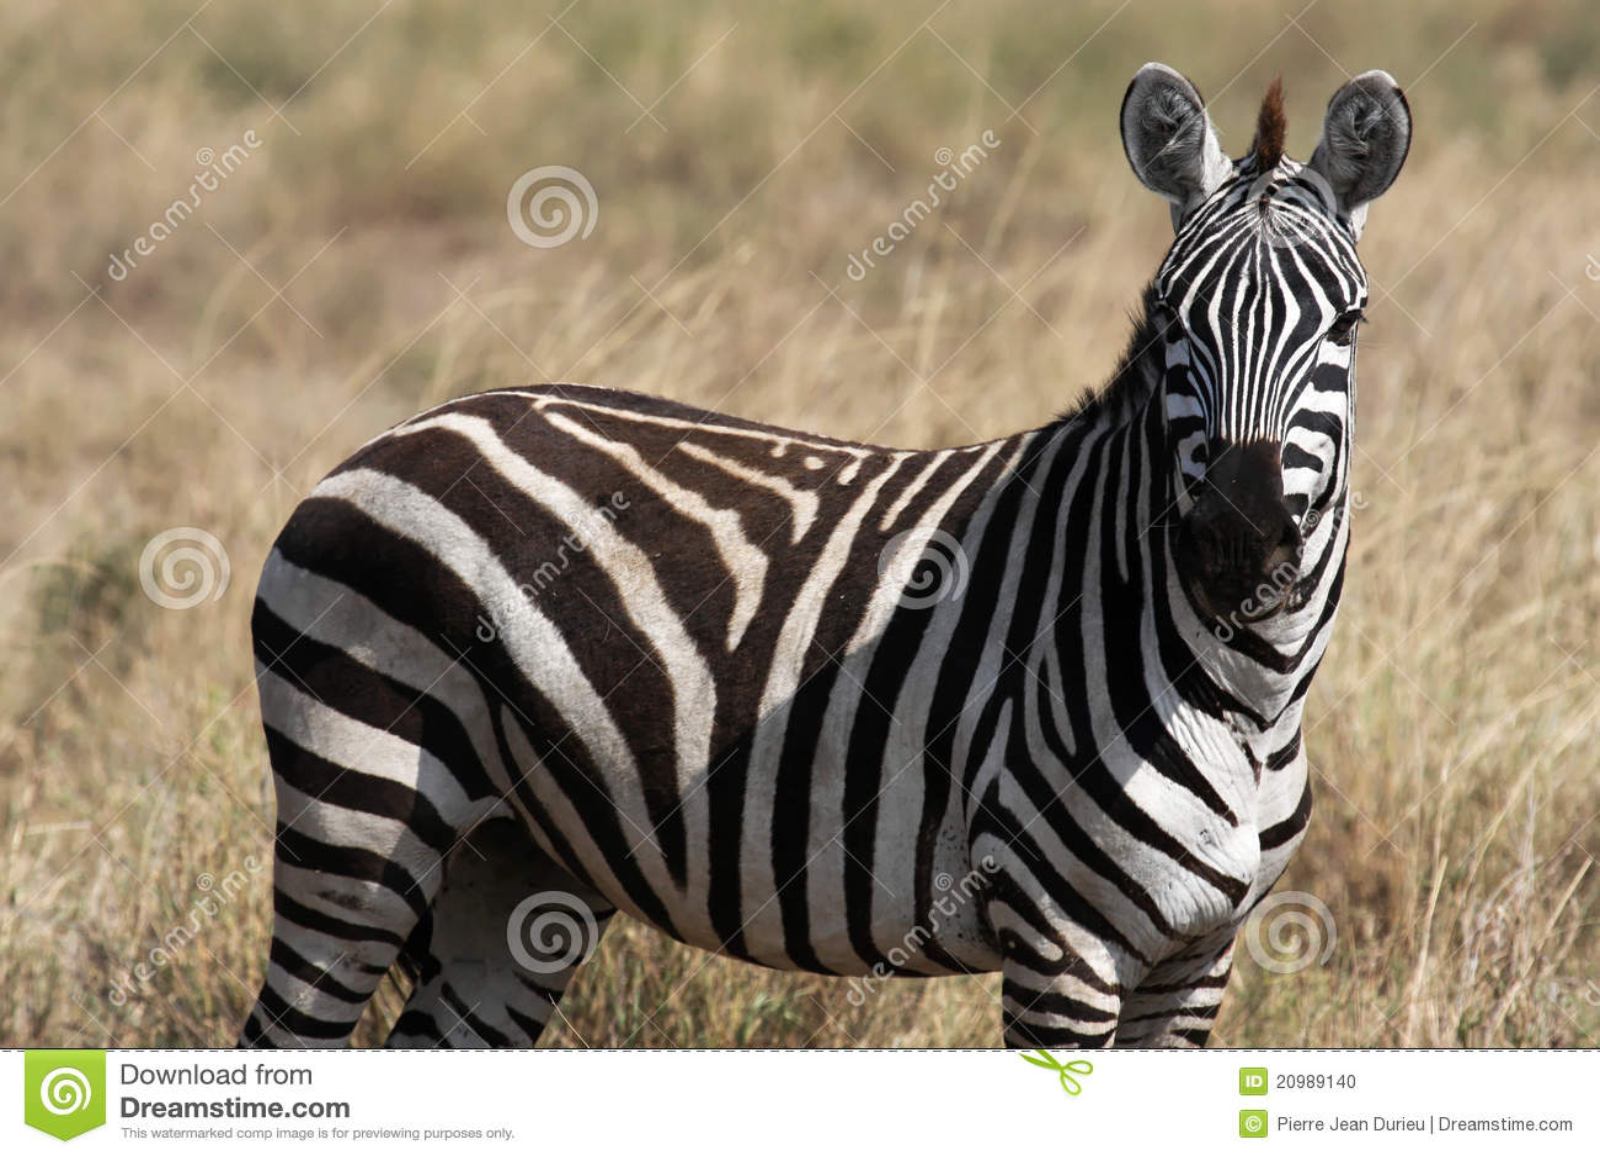 a zebra looks at you stock photo image 20989140. Black Bedroom Furniture Sets. Home Design Ideas